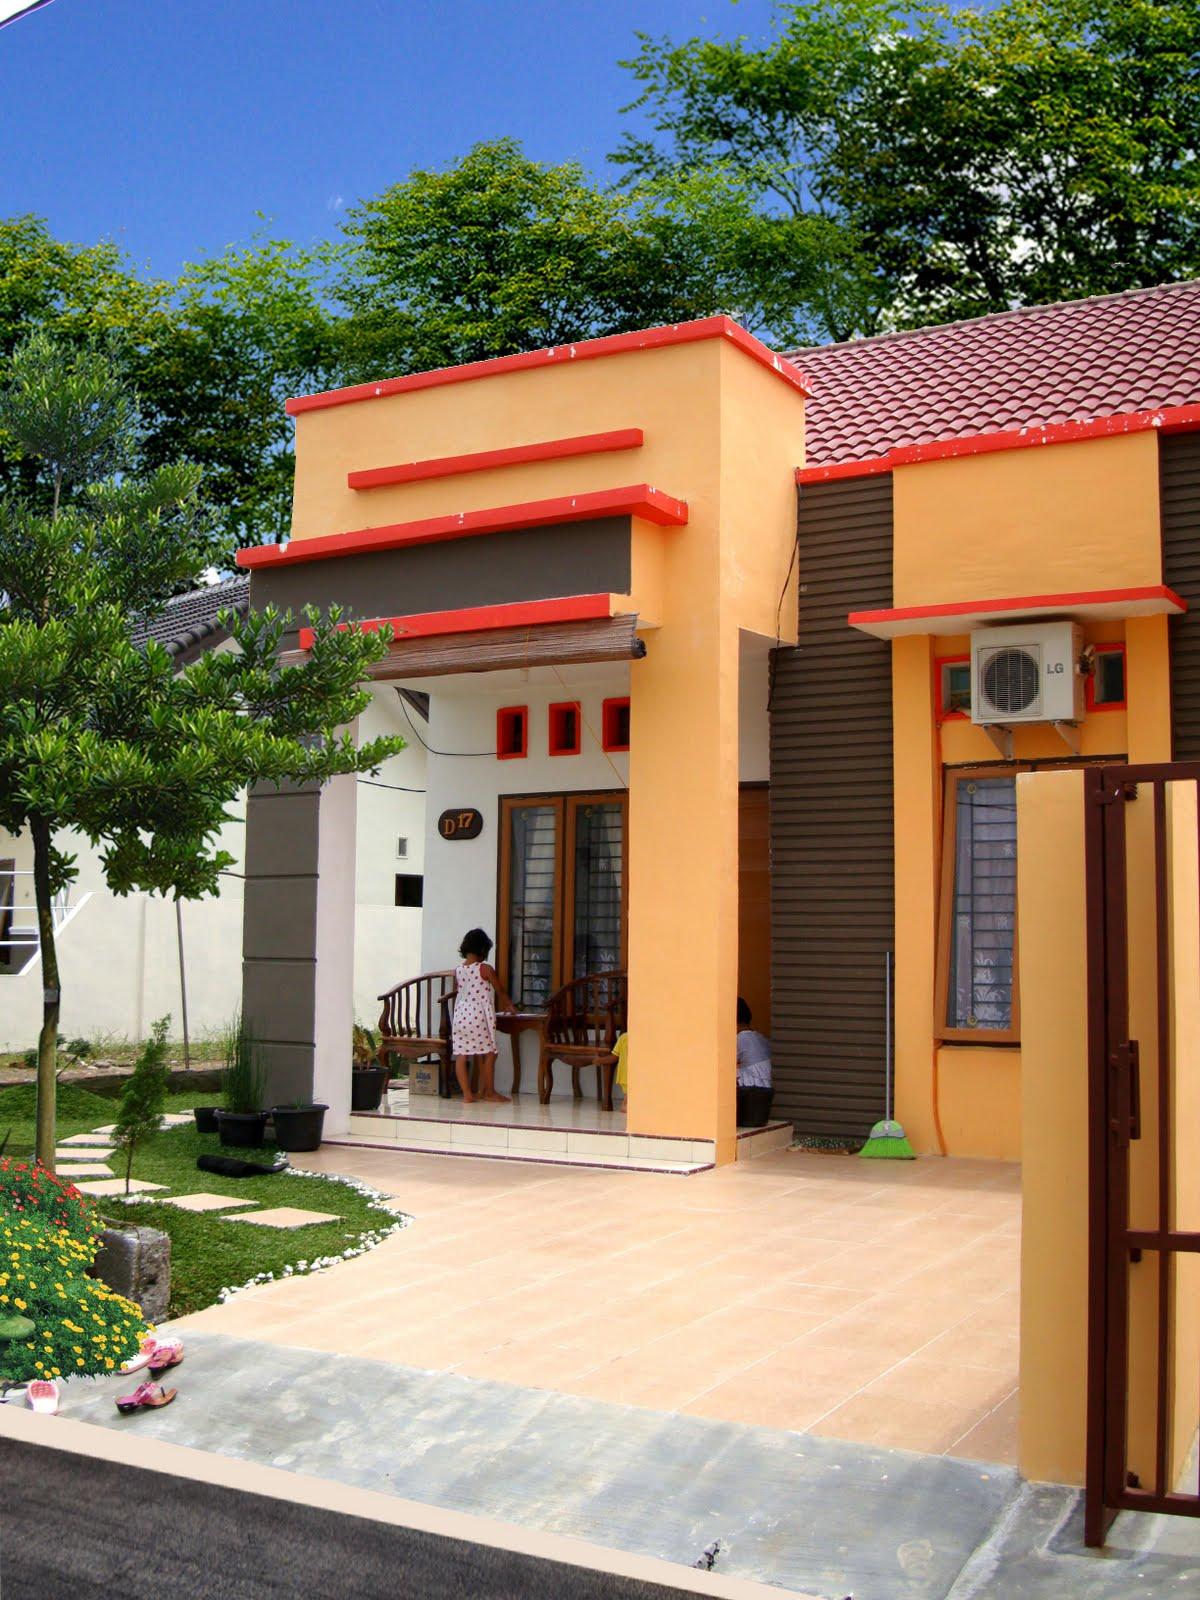 11 Contoh Rumah Minimalis Dengan Berbagai Pilihan Warna